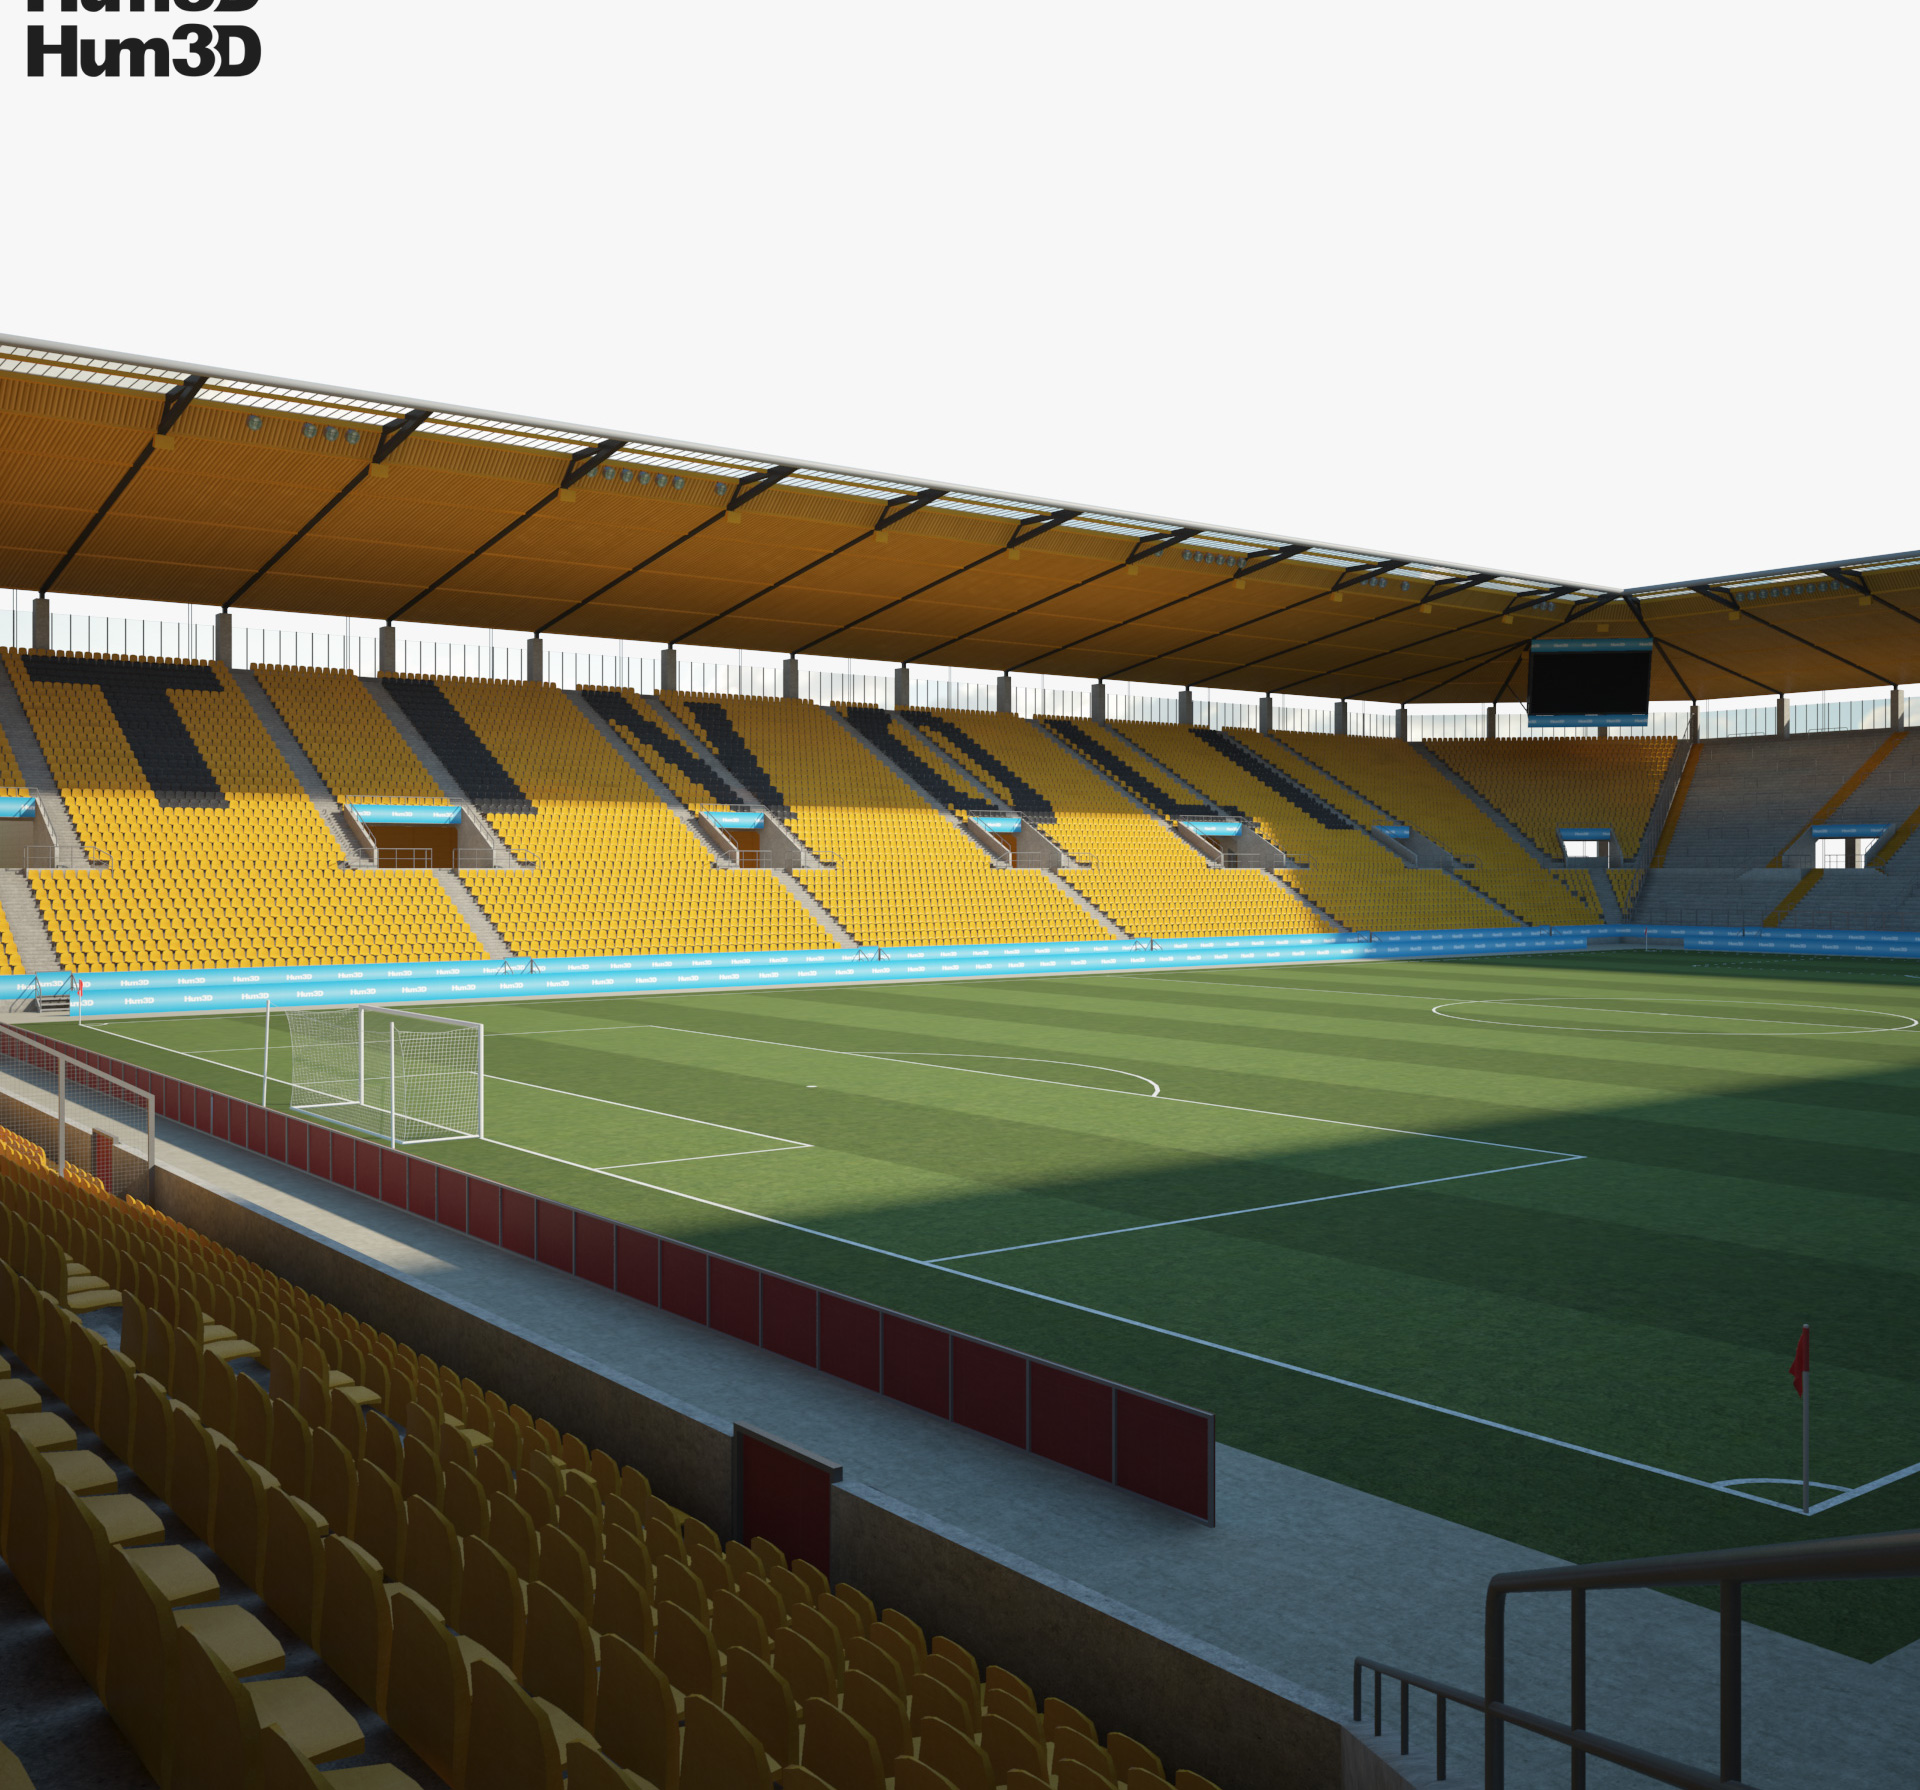 New Tivoli stadium 3d model